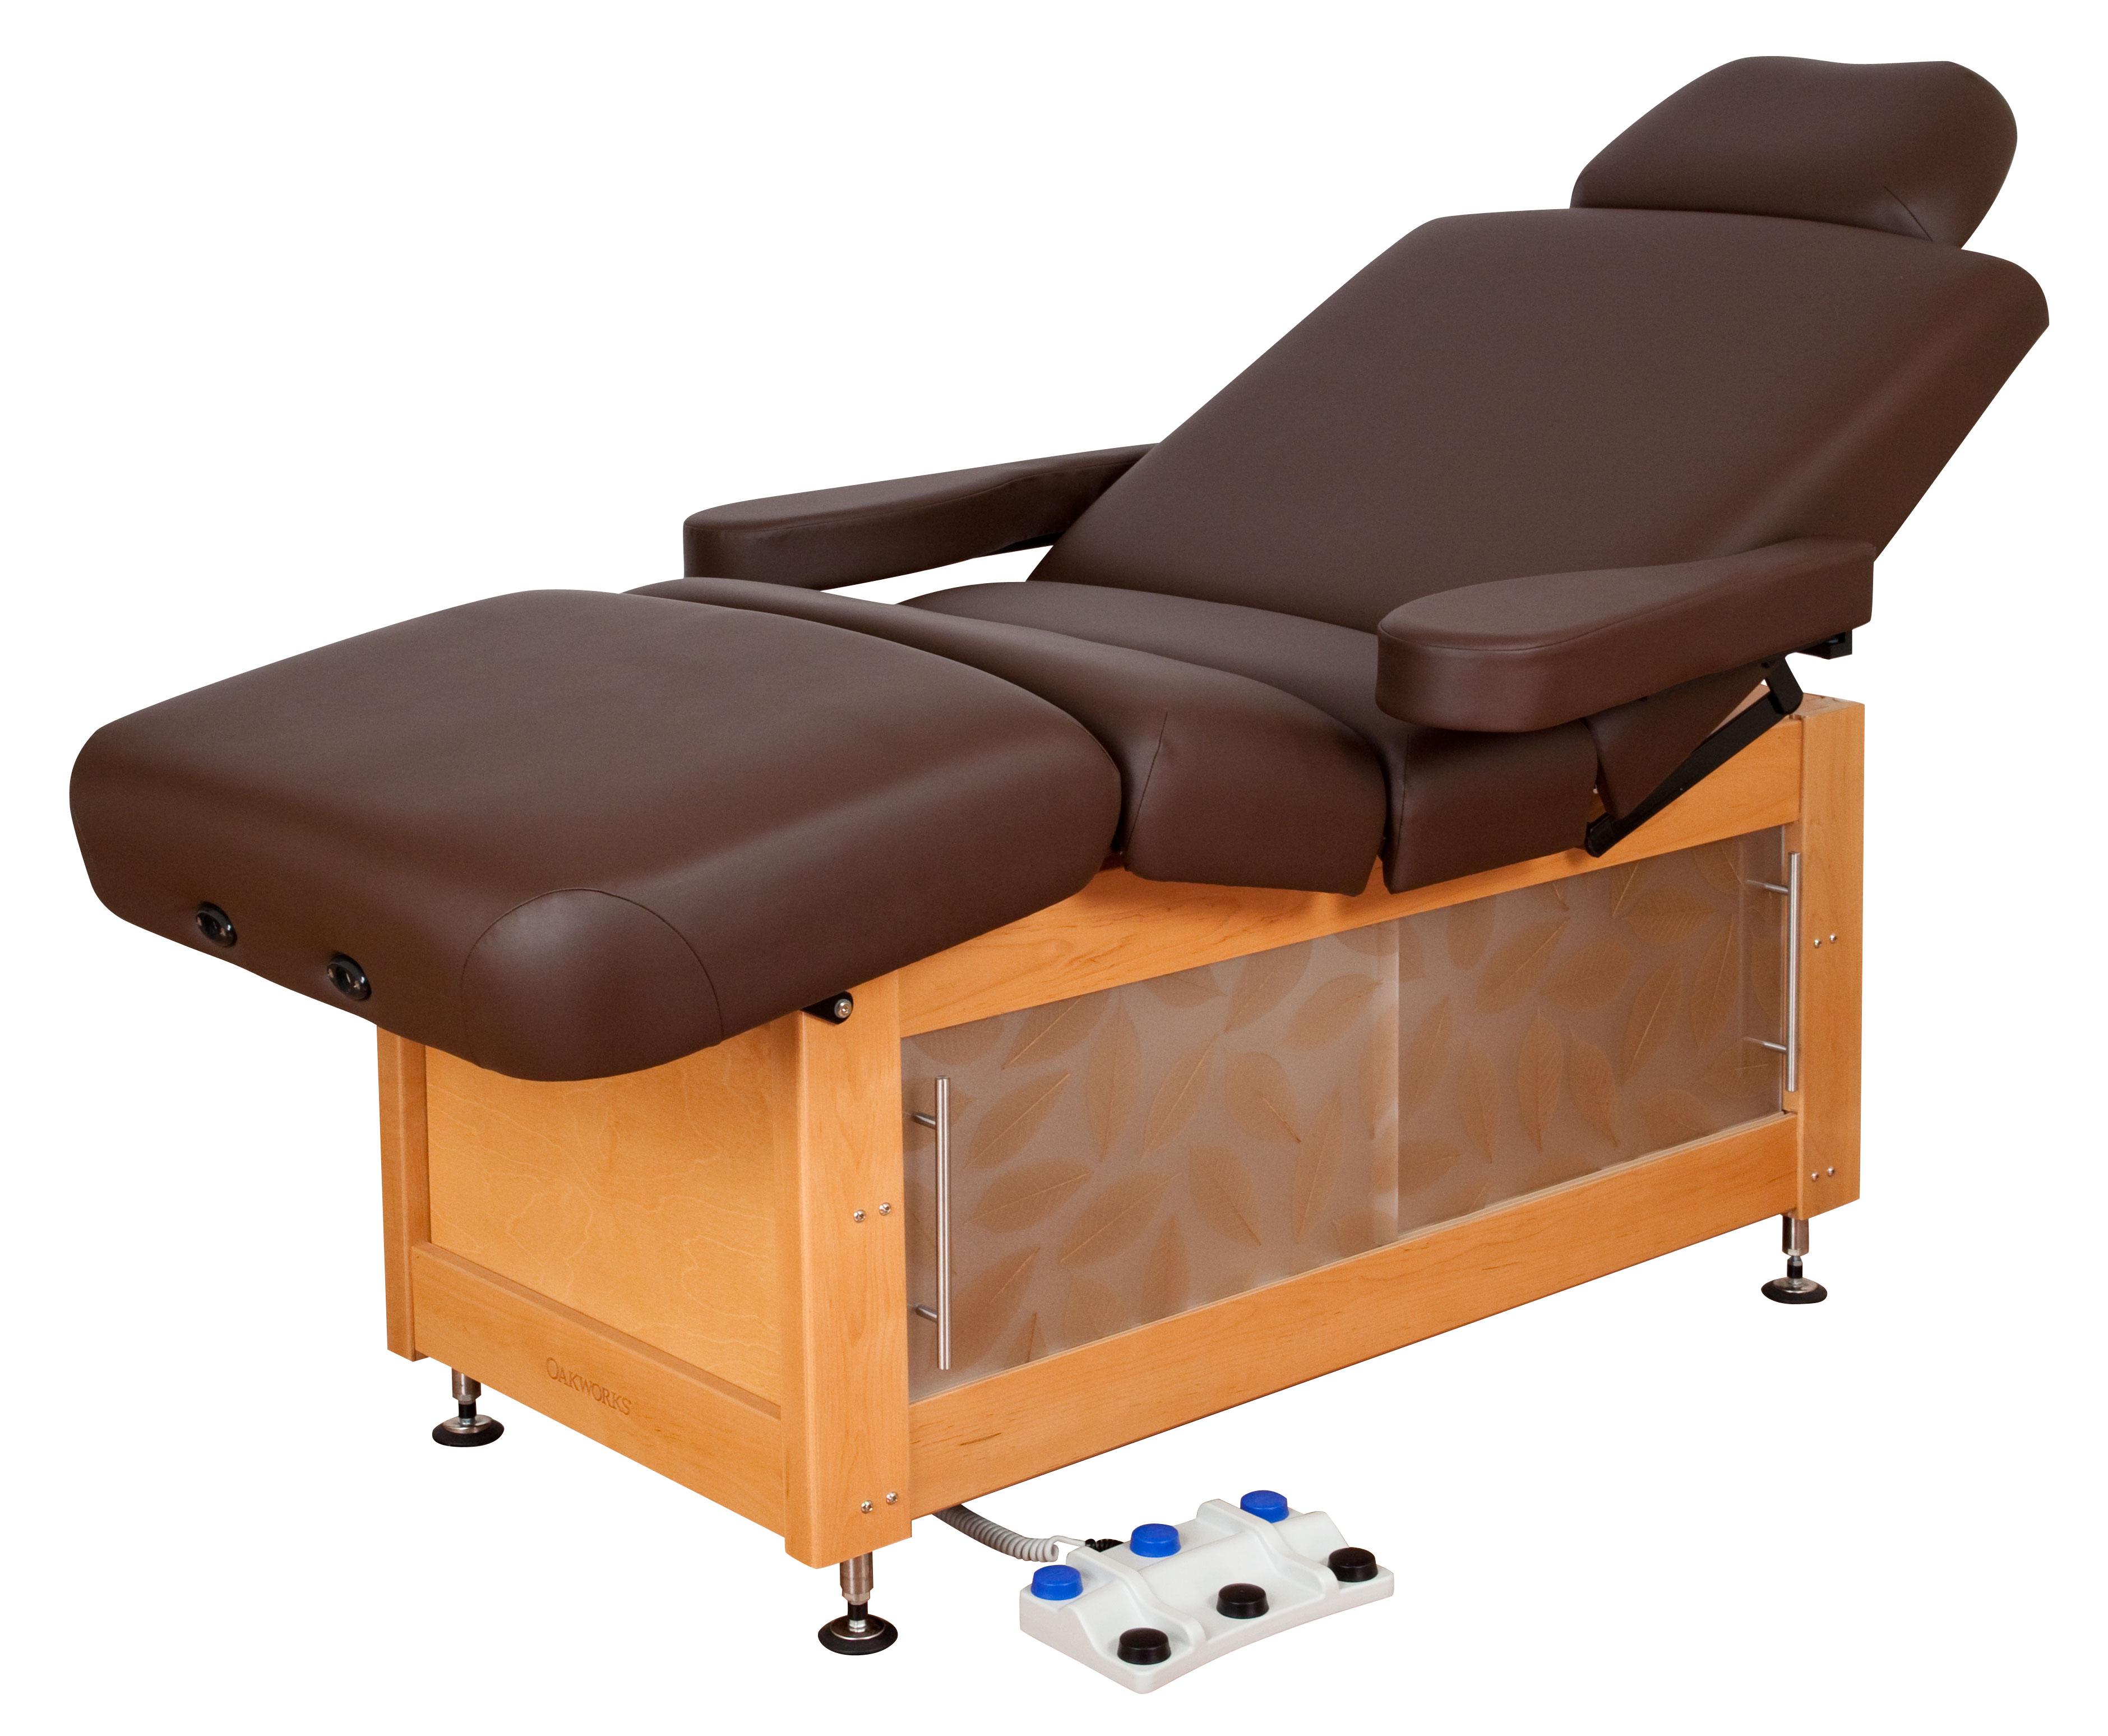 Clinician Premiere Electric Hydraulic Electric Salon Top – Massage